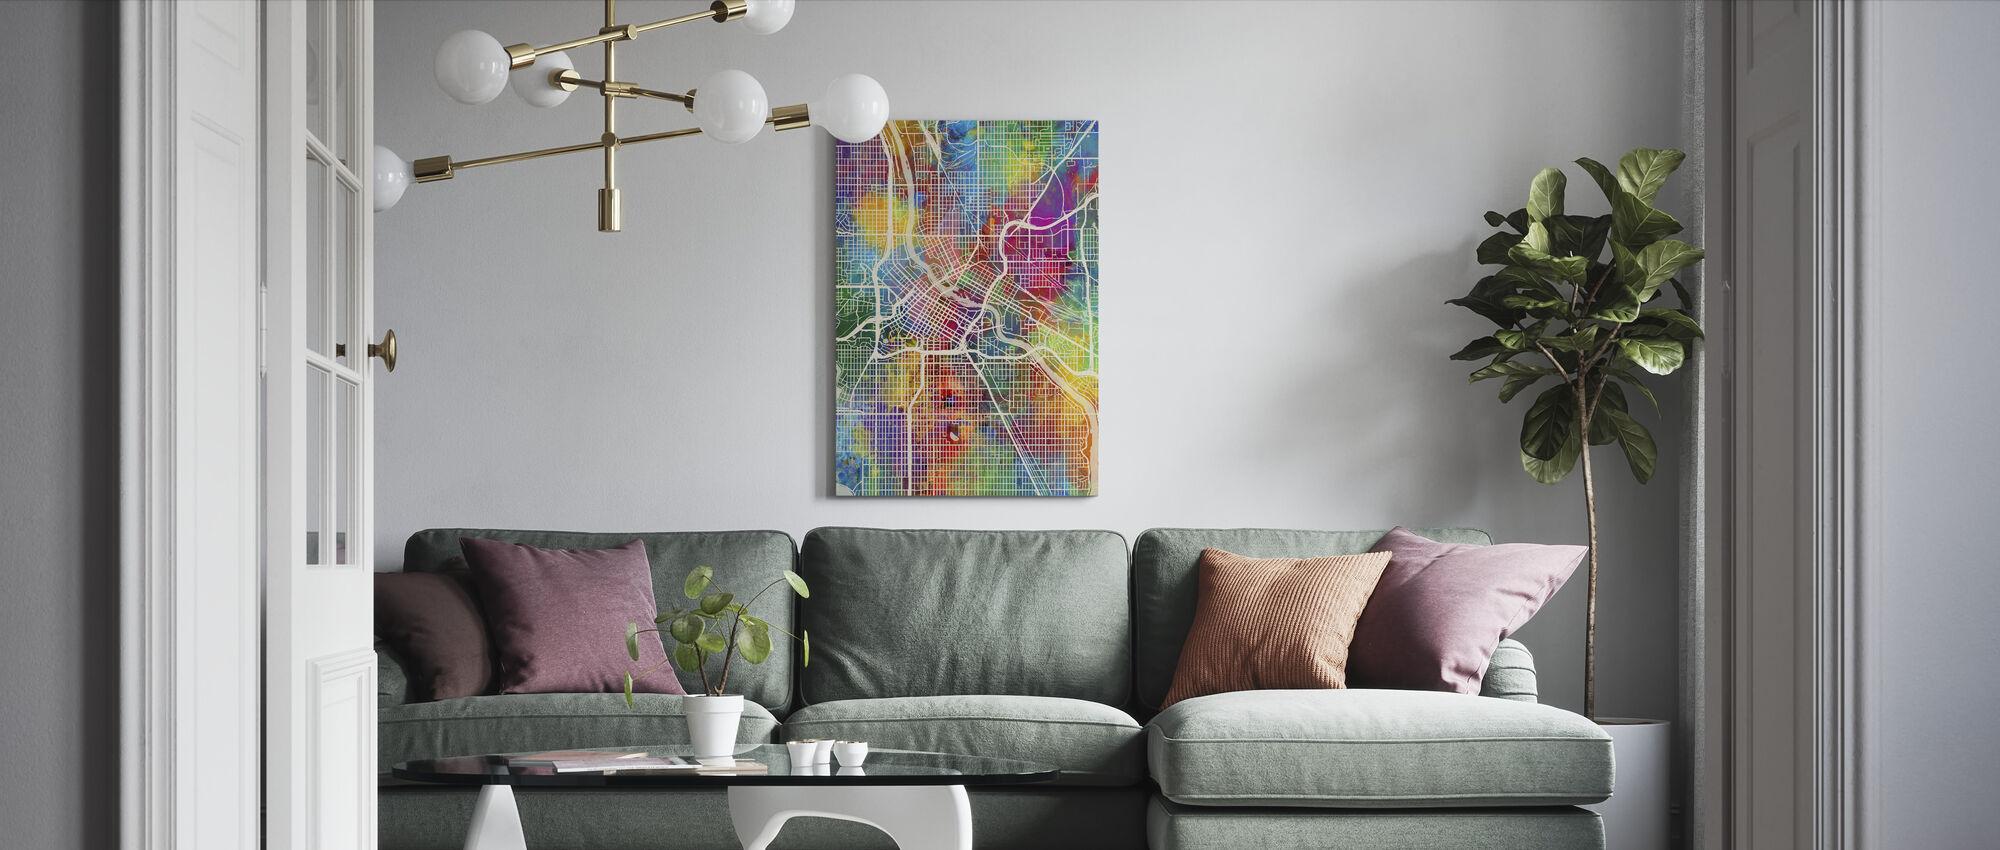 Minneapolis Minnesota City Map - Canvas print - Living Room